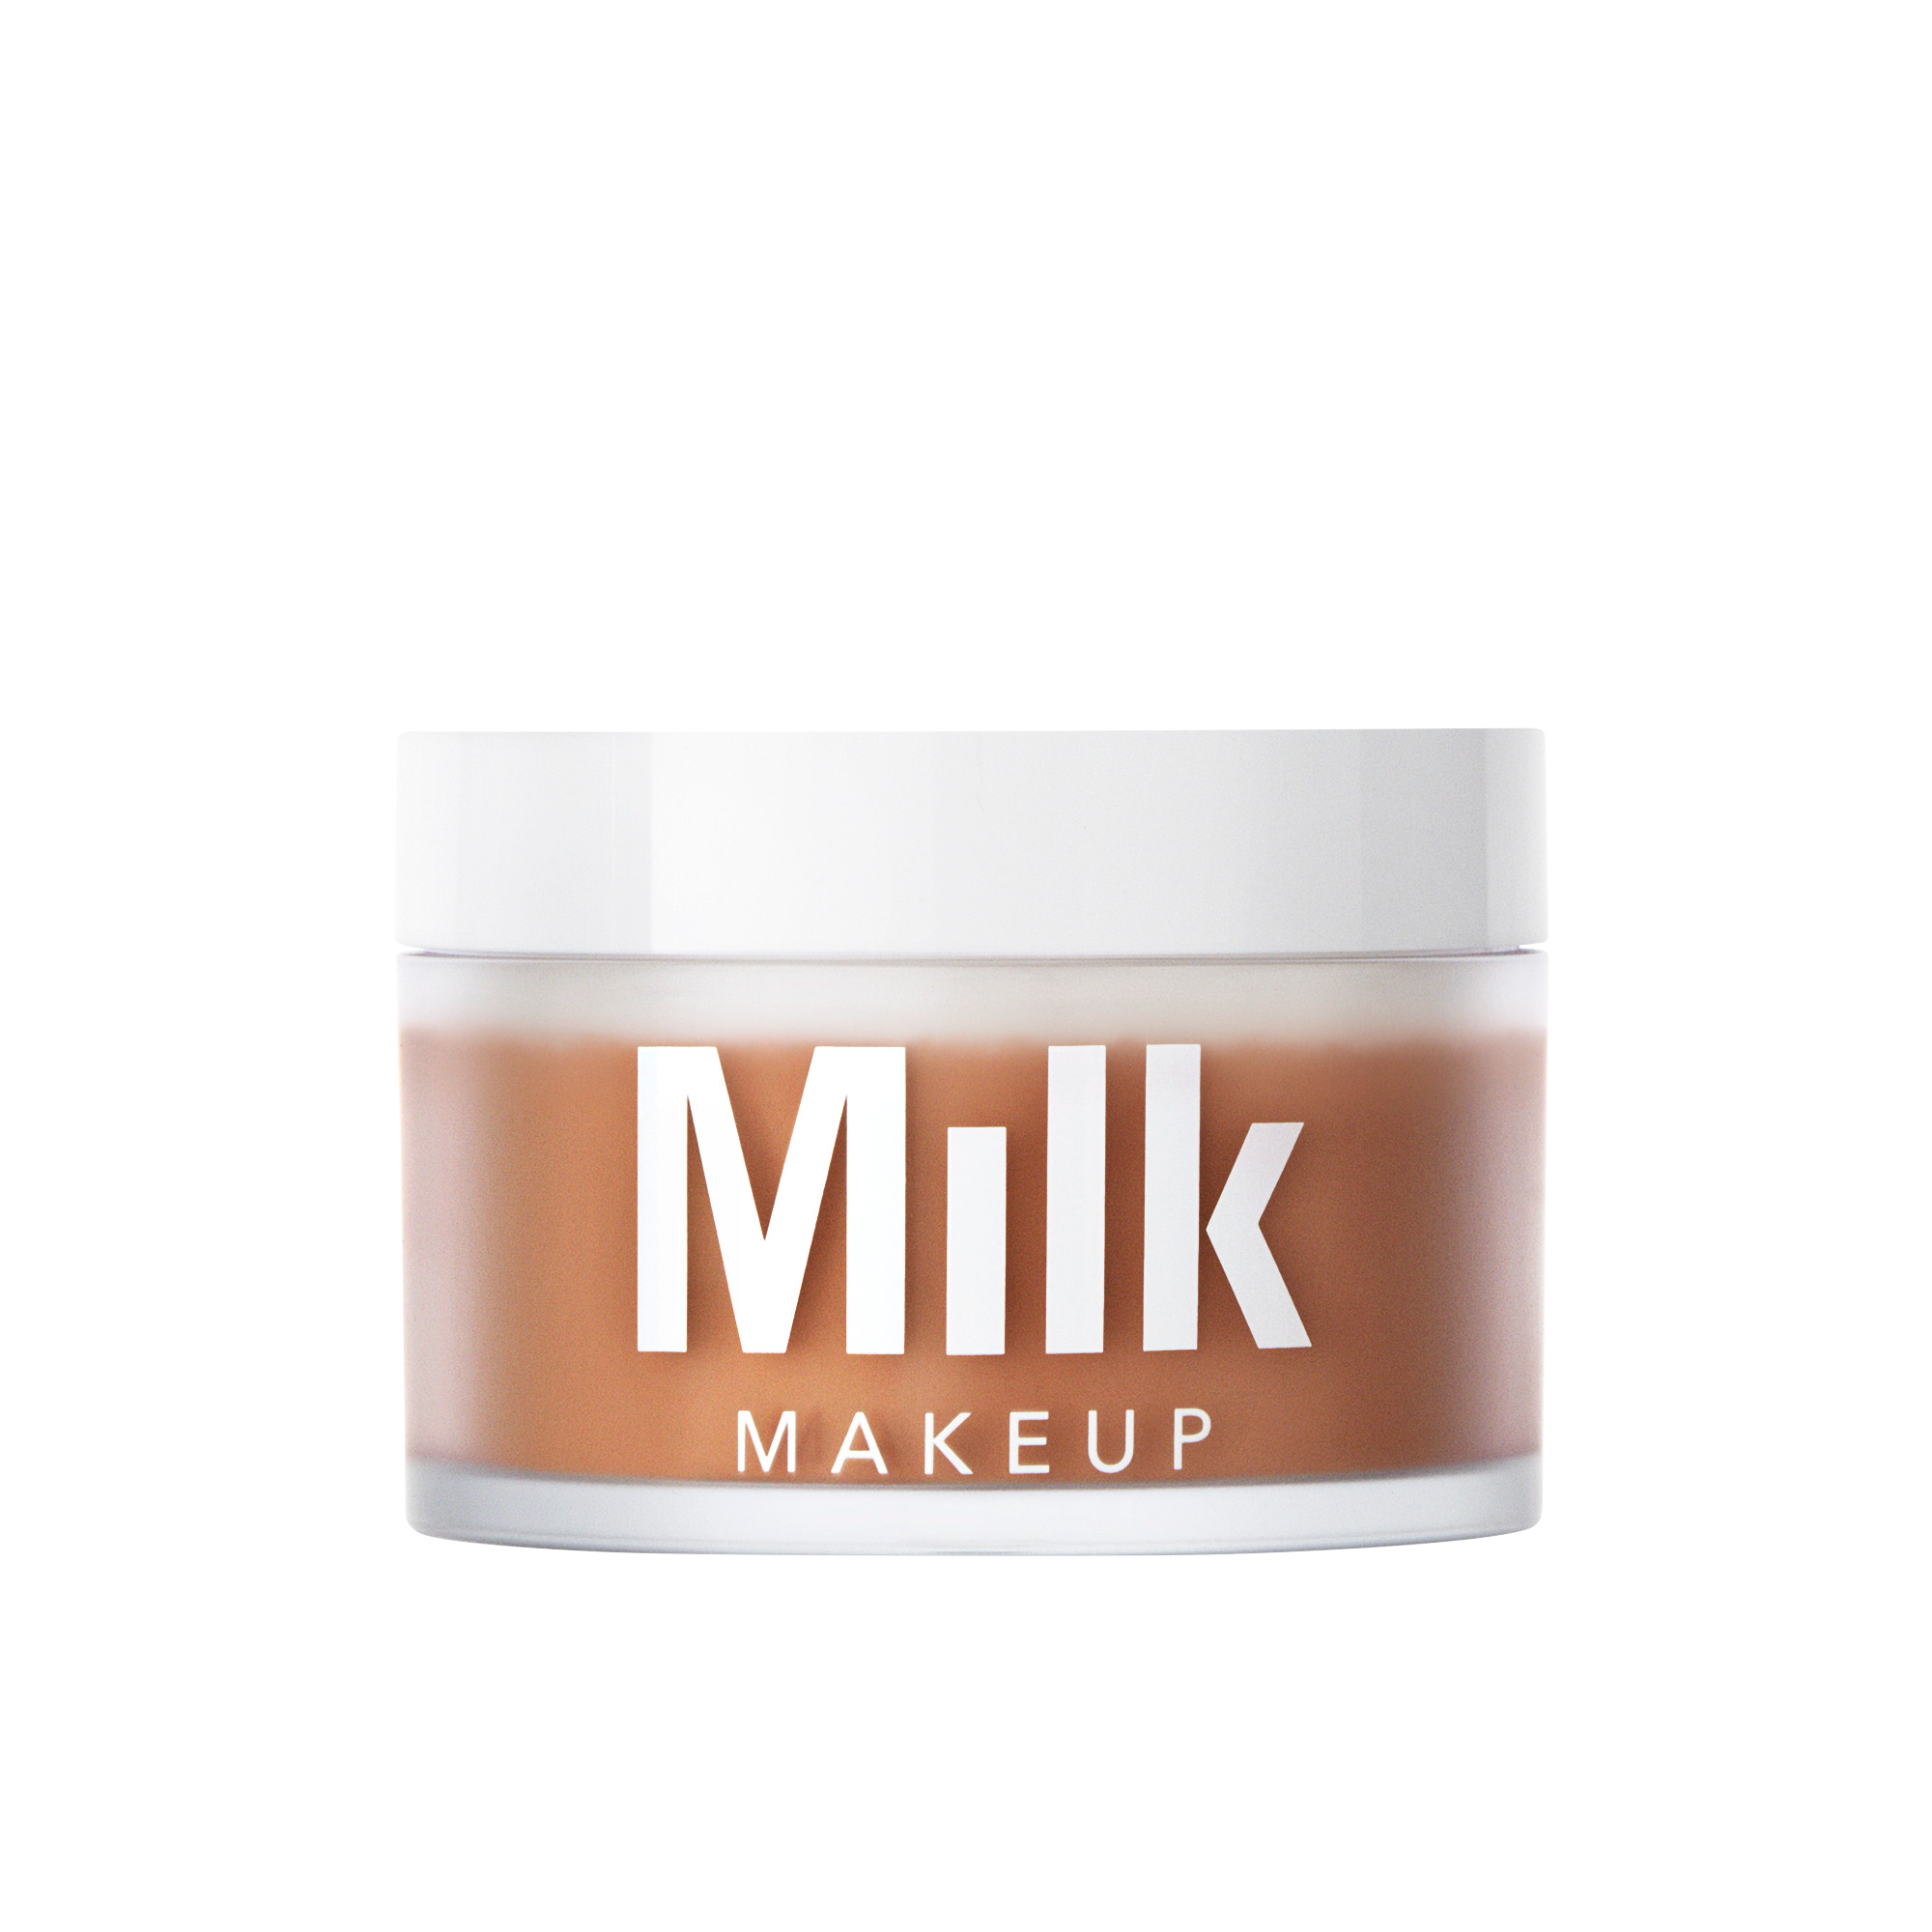 Milk Makeup Blur + Set Matte Loose Setting Powder in Transluscent Deep